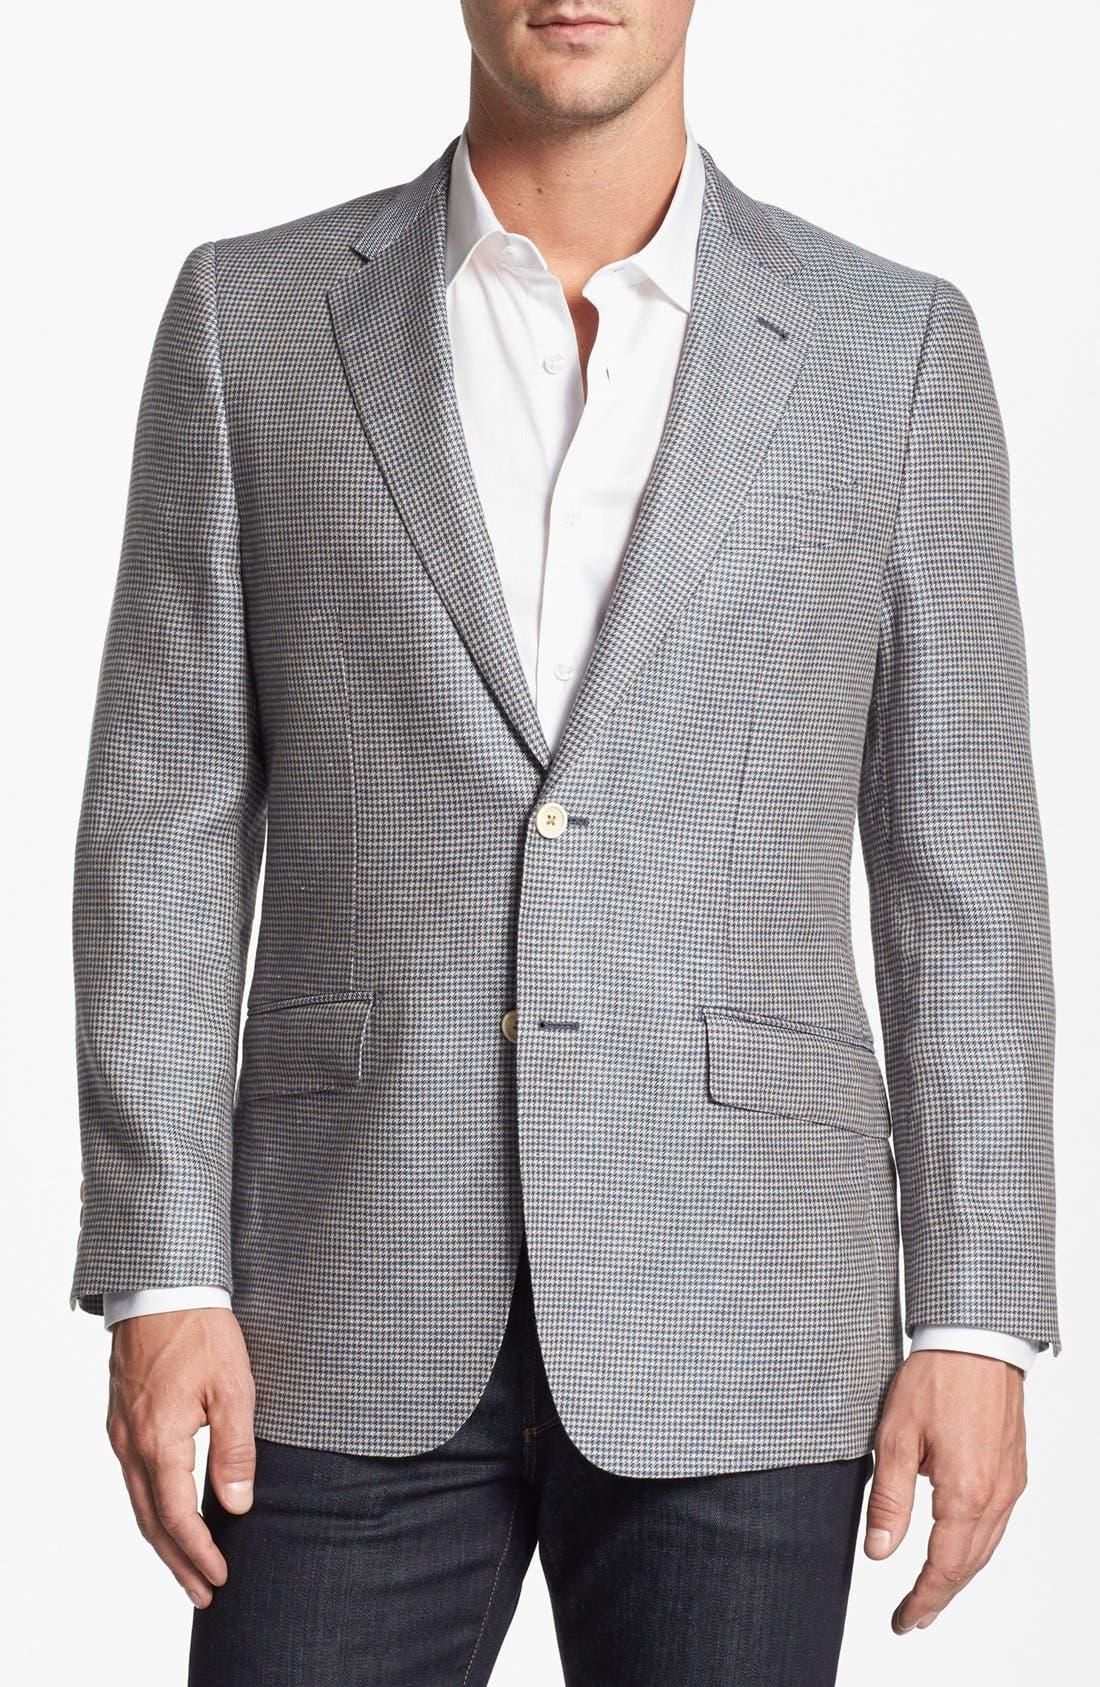 Main Image - Robert Talbott Linen Sportcoat